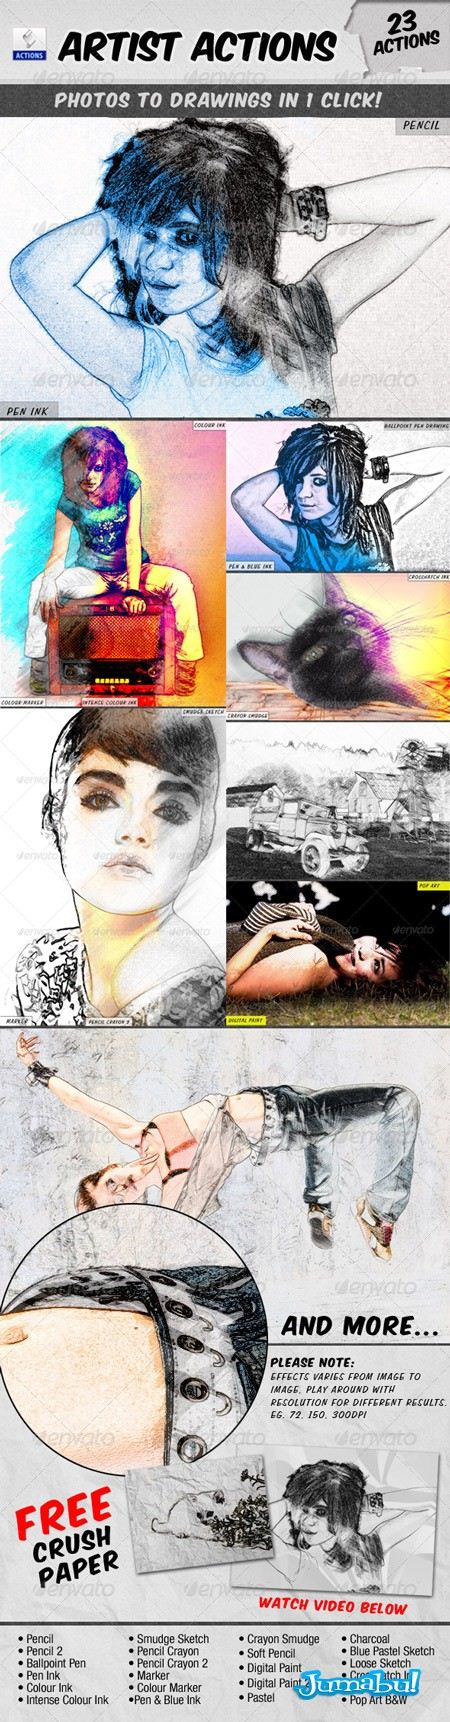 fotografias-artistas-dibujo-psd